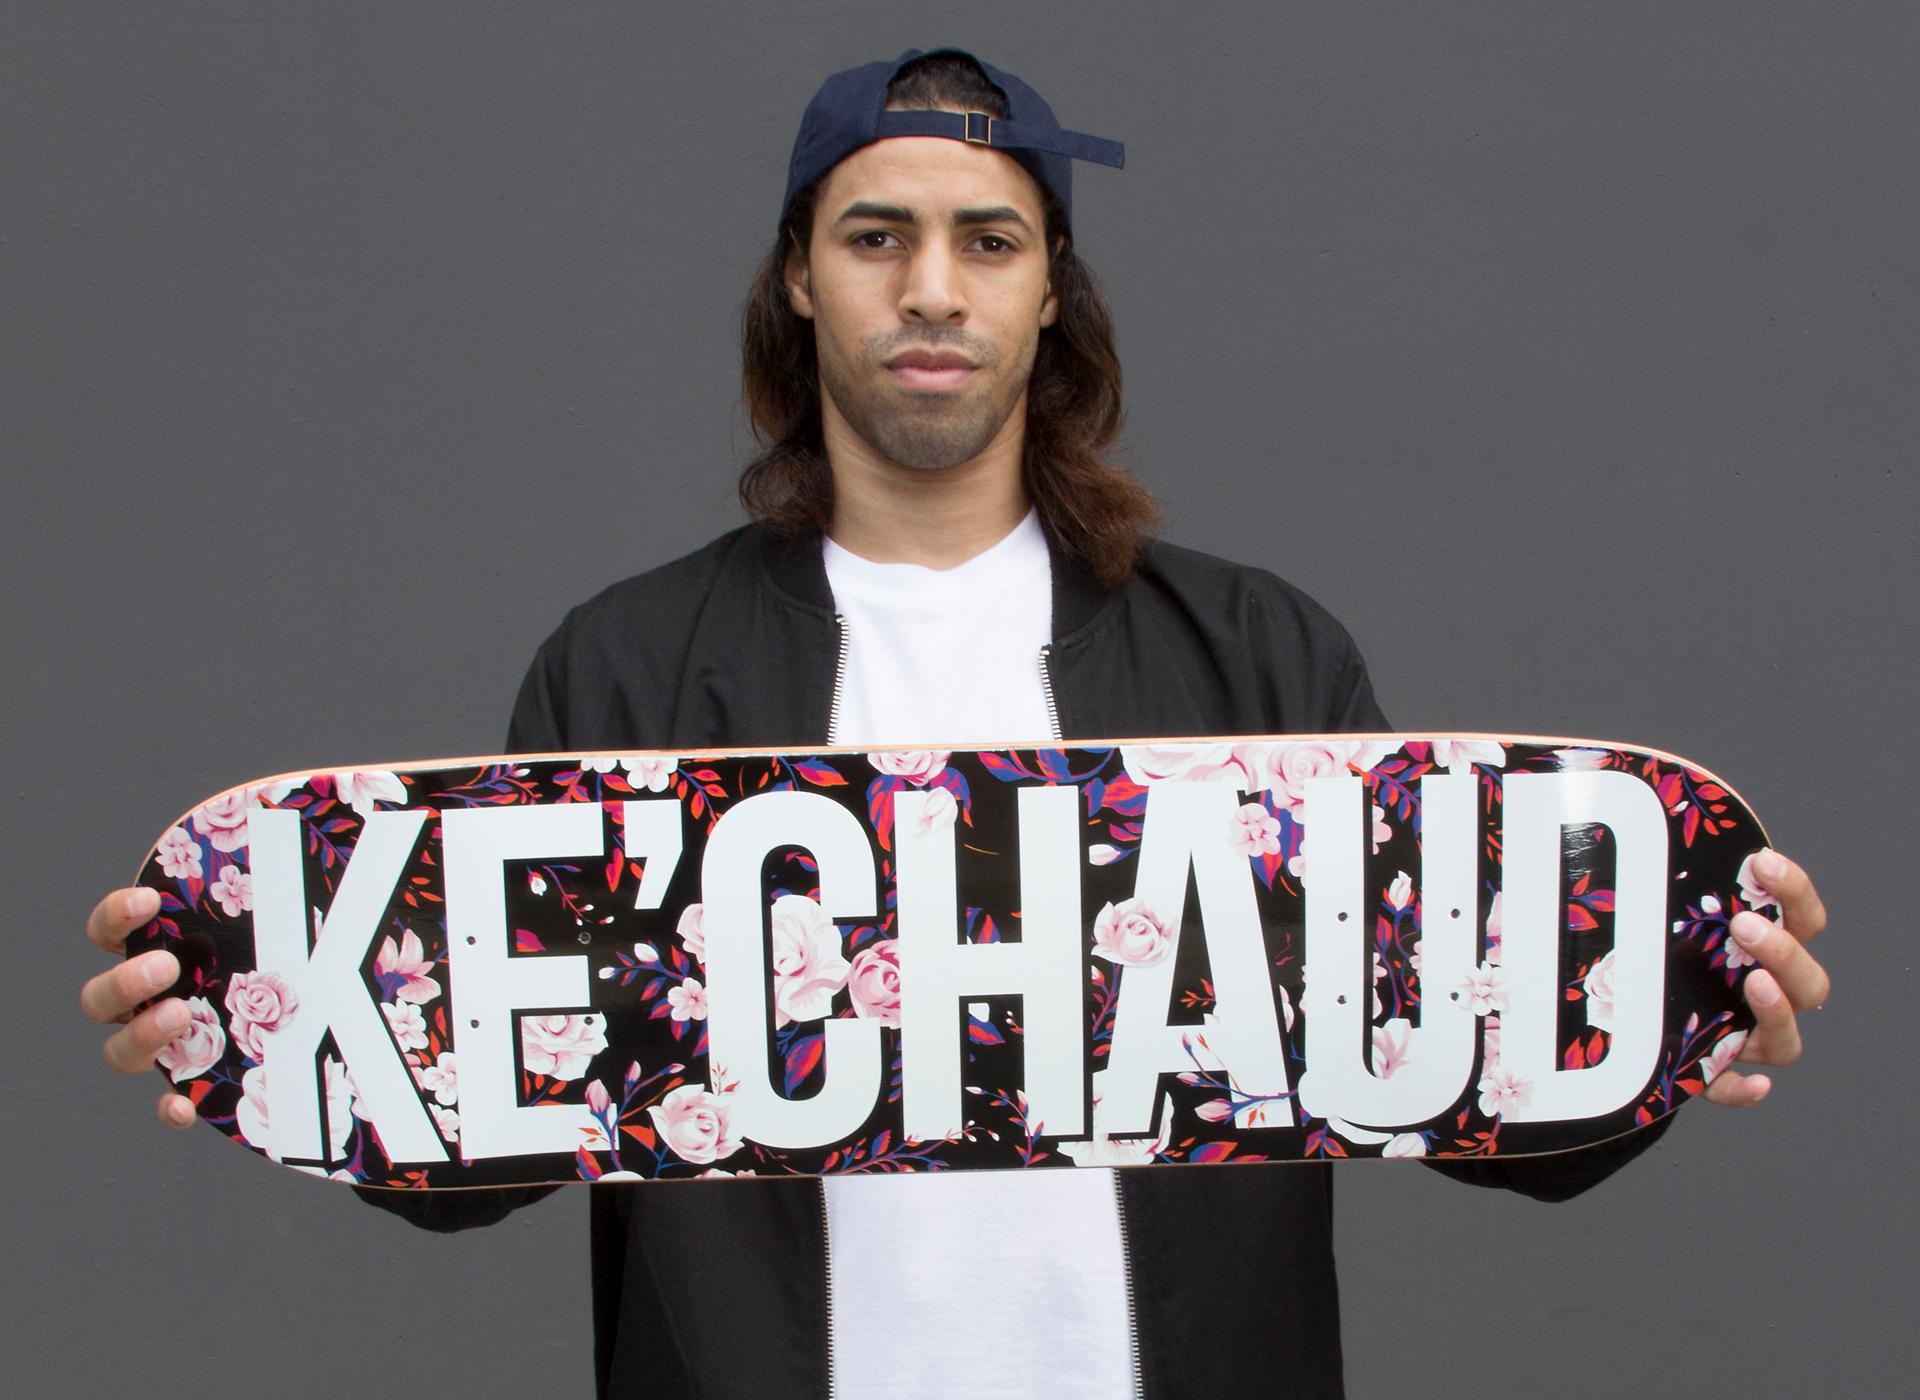 Darkstar-Skateboards-Kechaud-Portrait.jpg